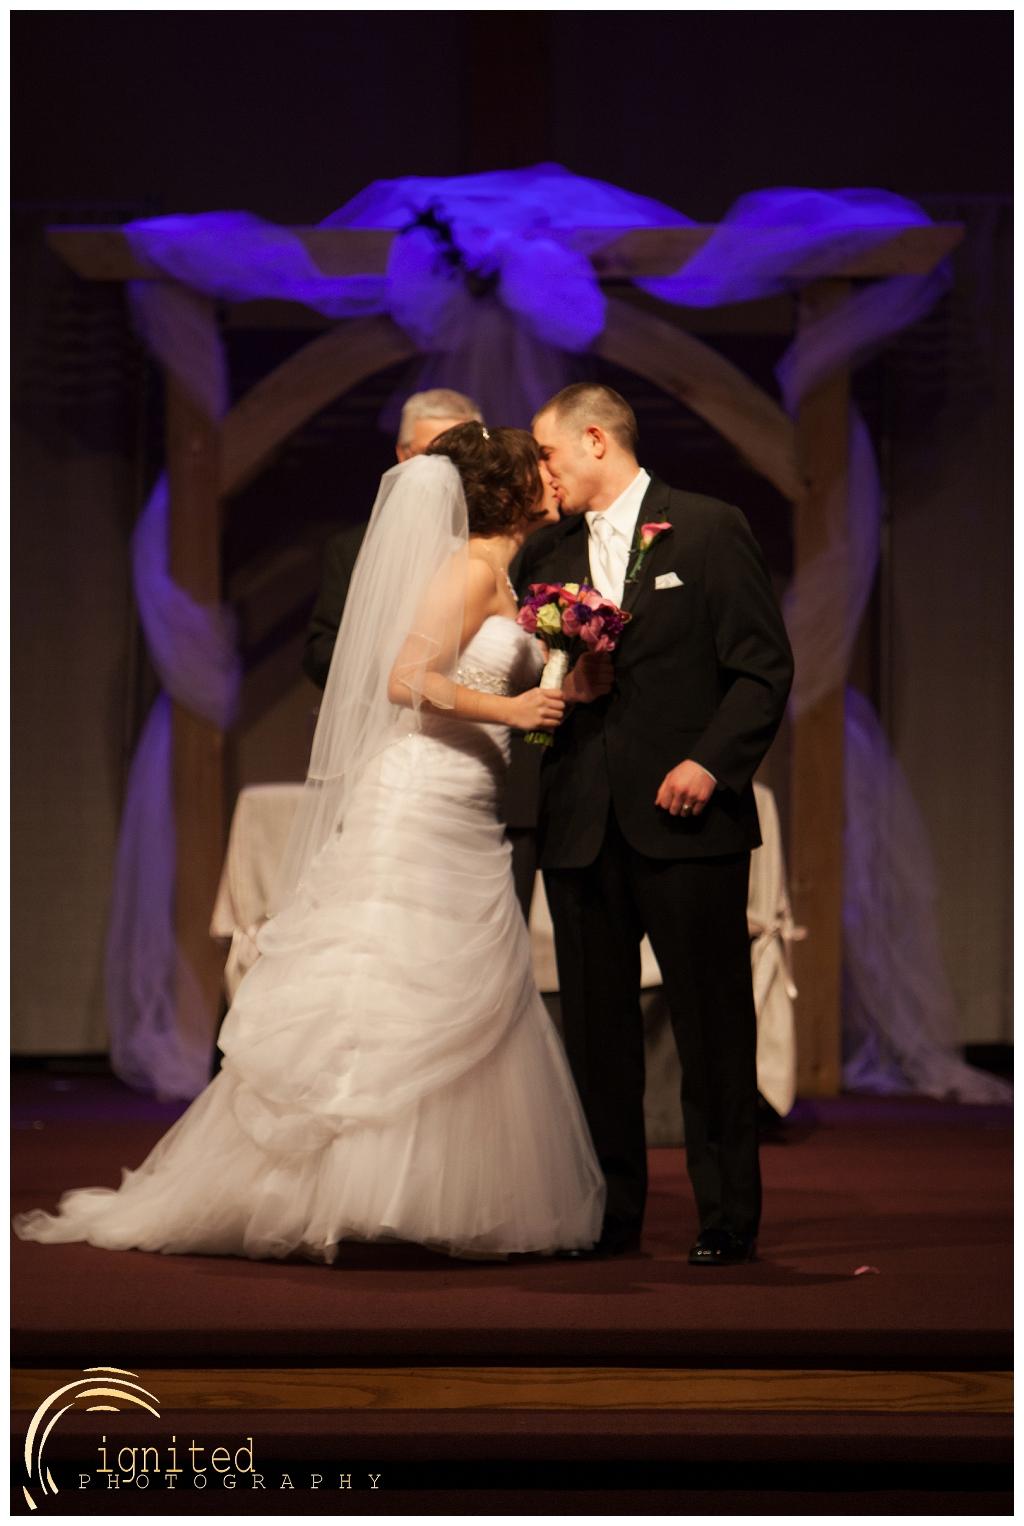 ignited Photography Alyssa  Castwell and Caleb Merna Wedding Brighton Nazarene The Naz Howell MI_0034.jpg